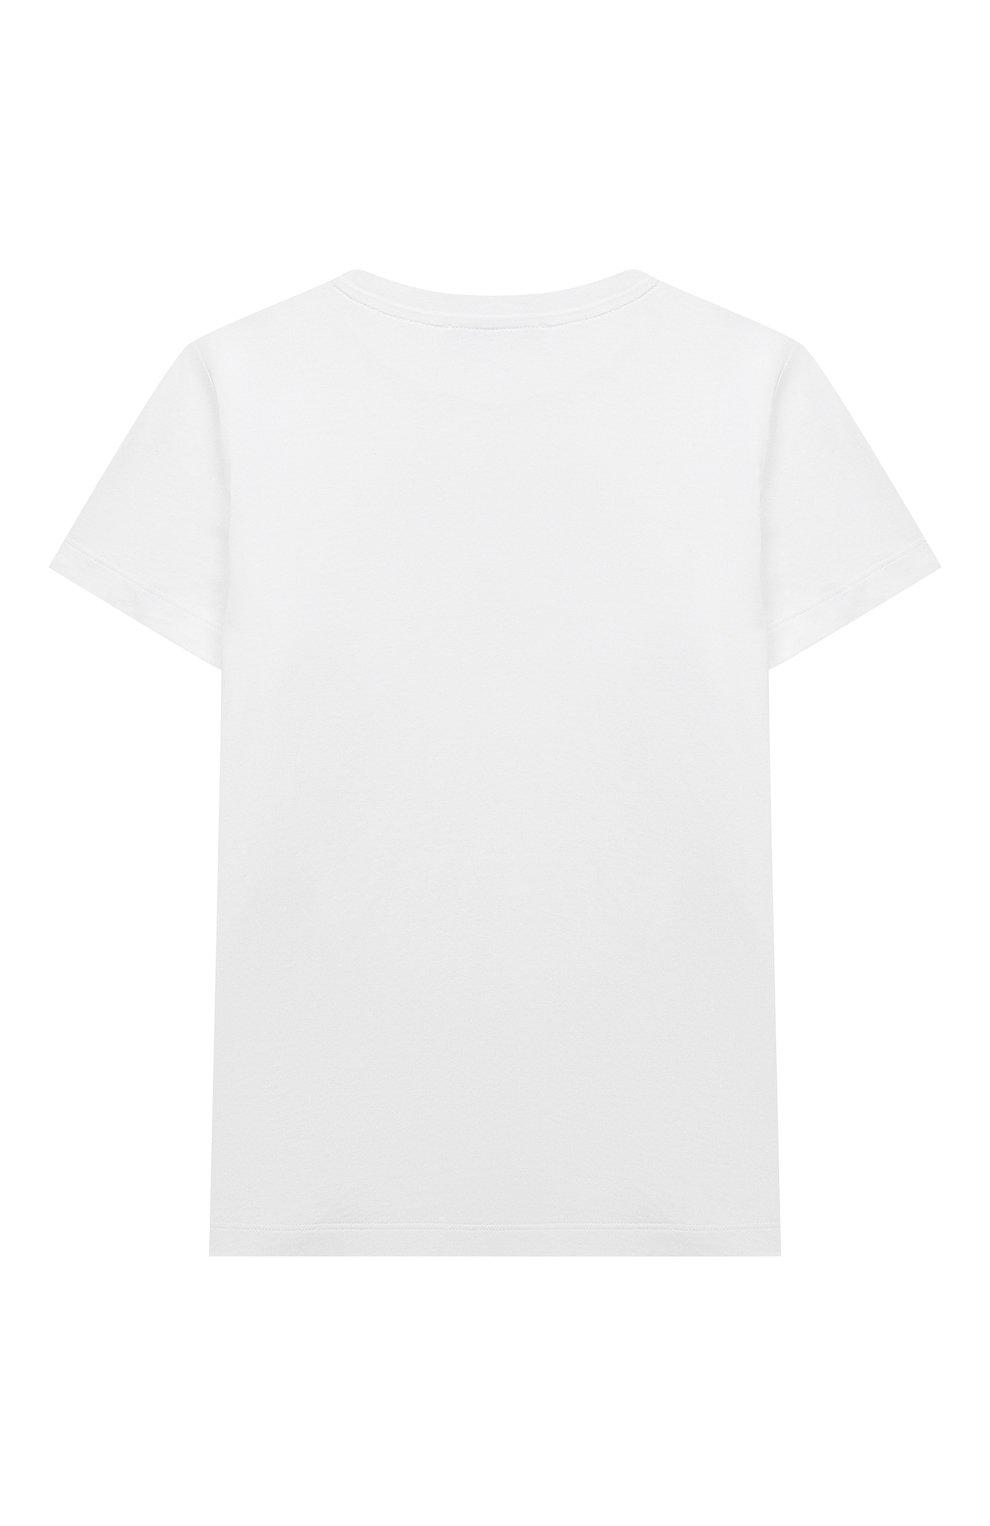 Детский футболка BALMAIN белого цвета, арт. 6M8901 | Фото 2